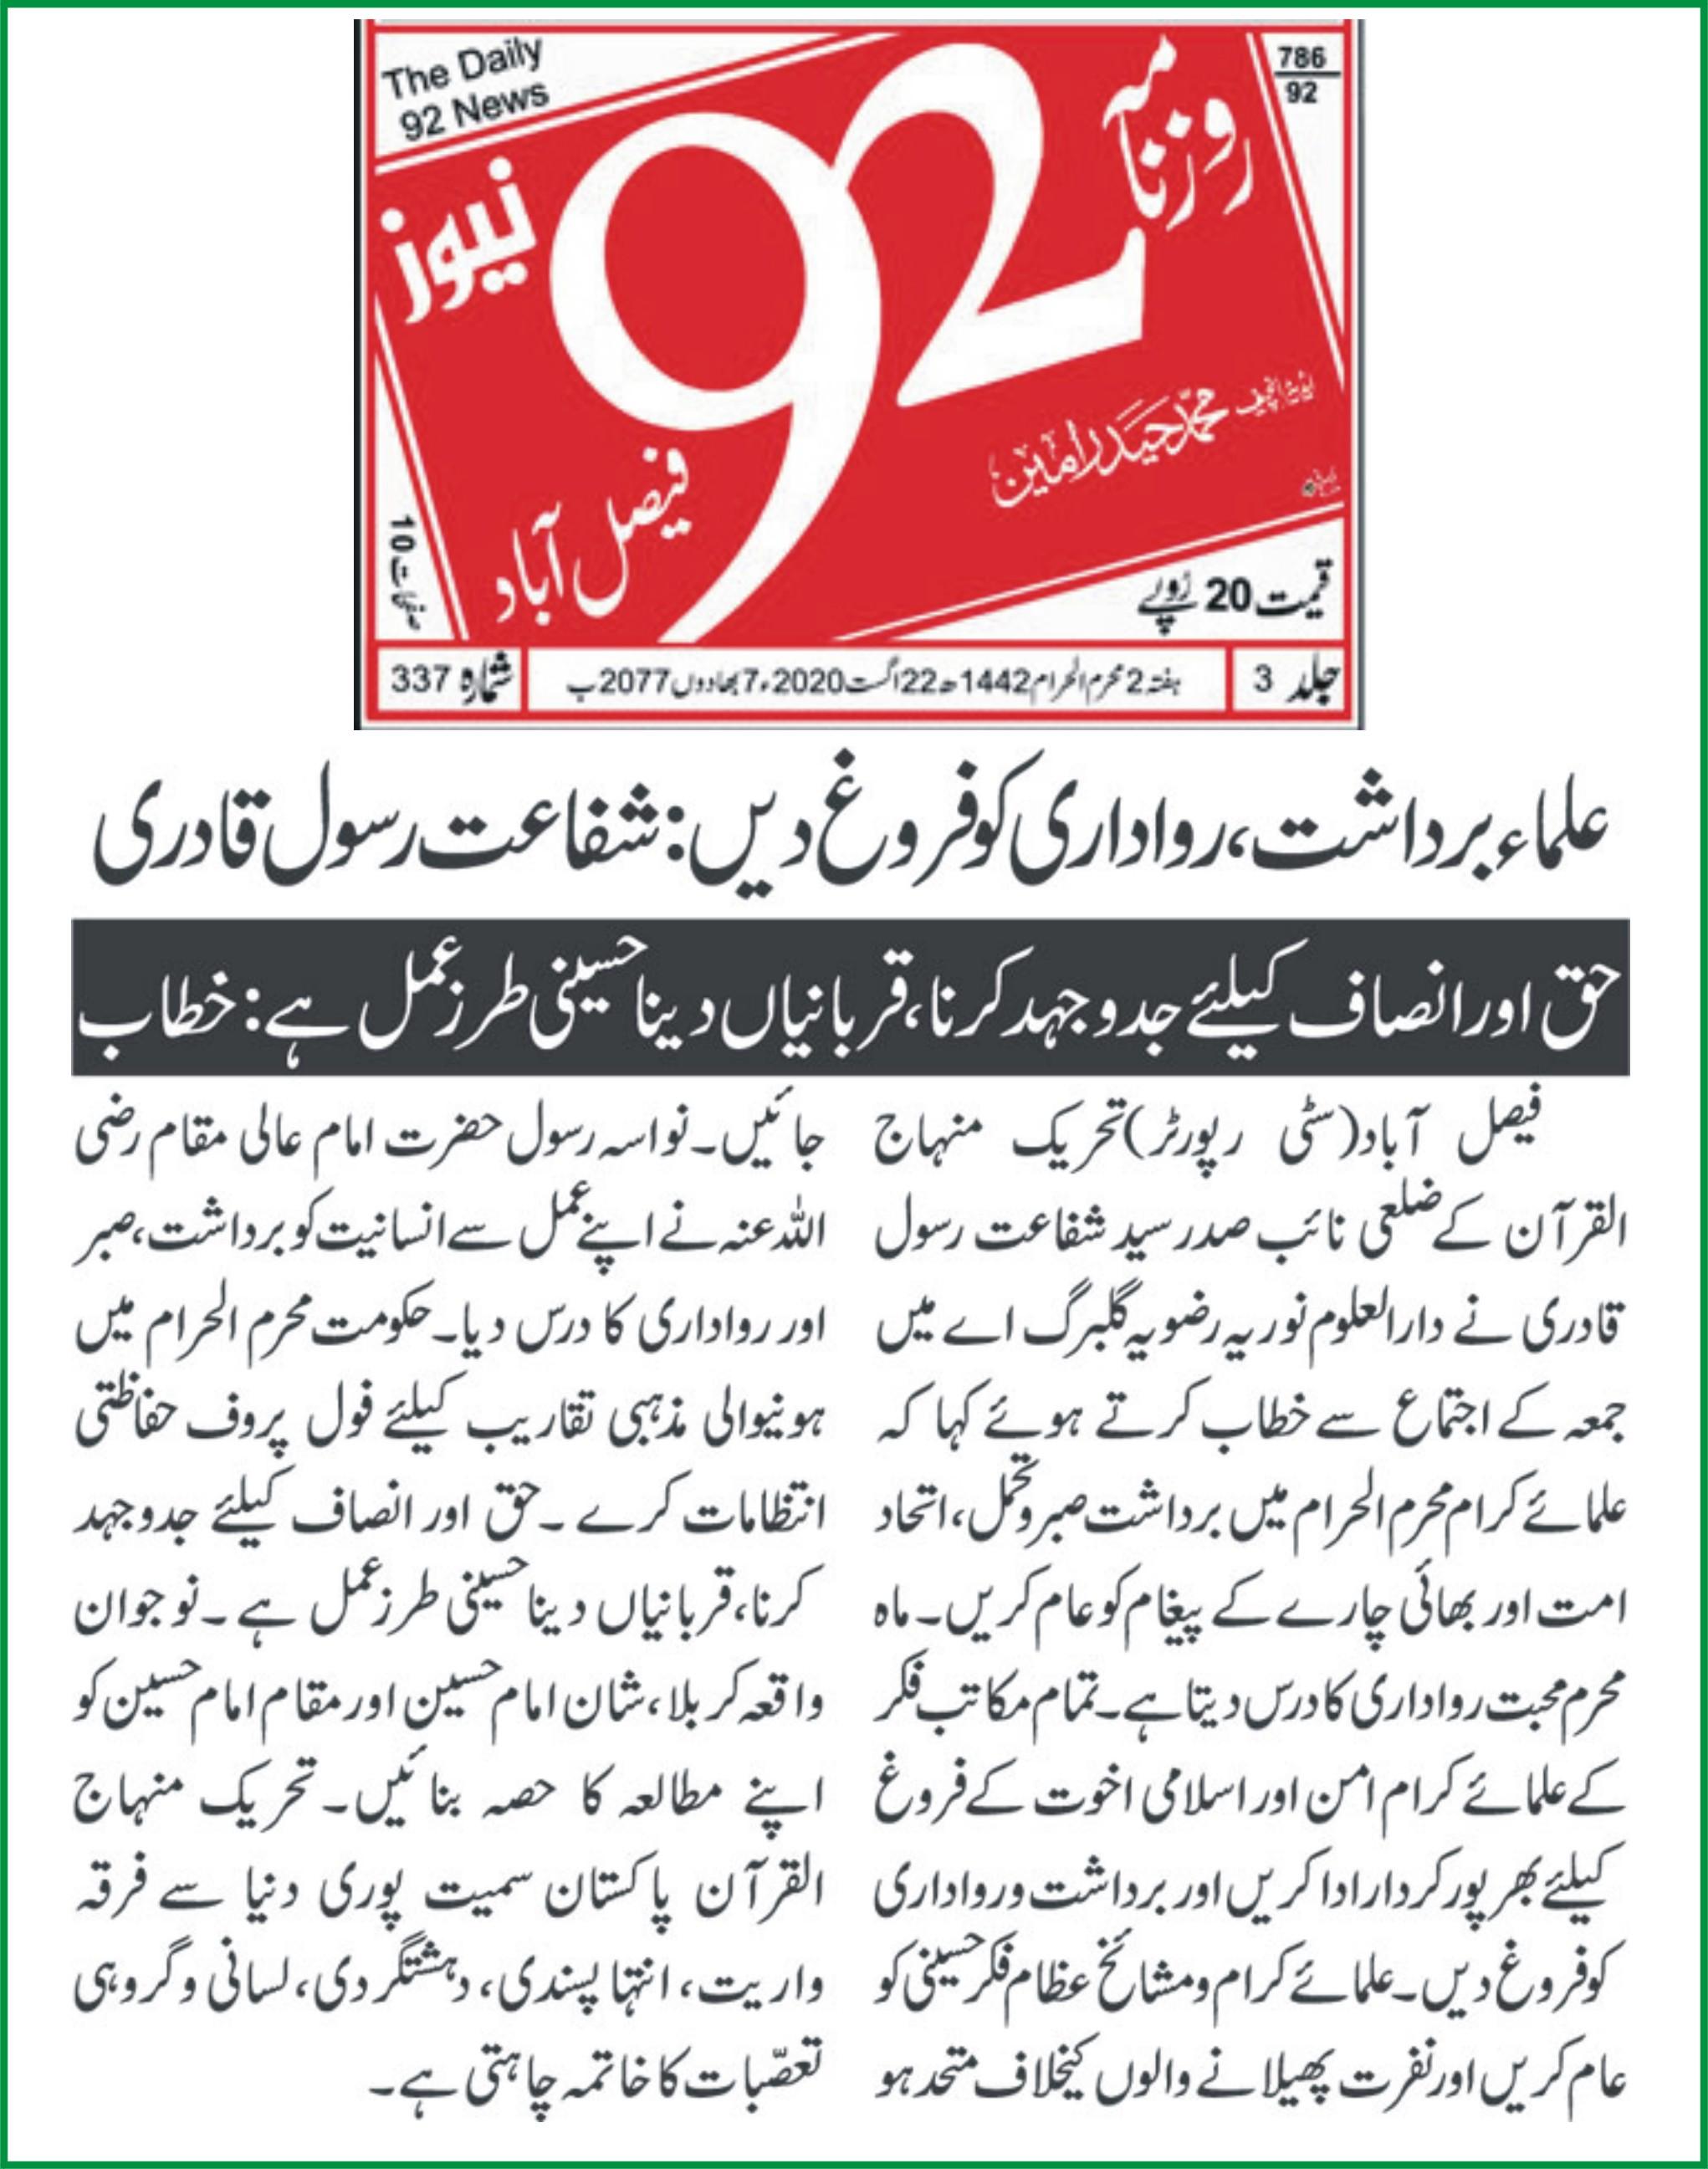 Minhaj-ul-Quran  Print Media Coverage Daily 92 News page 7